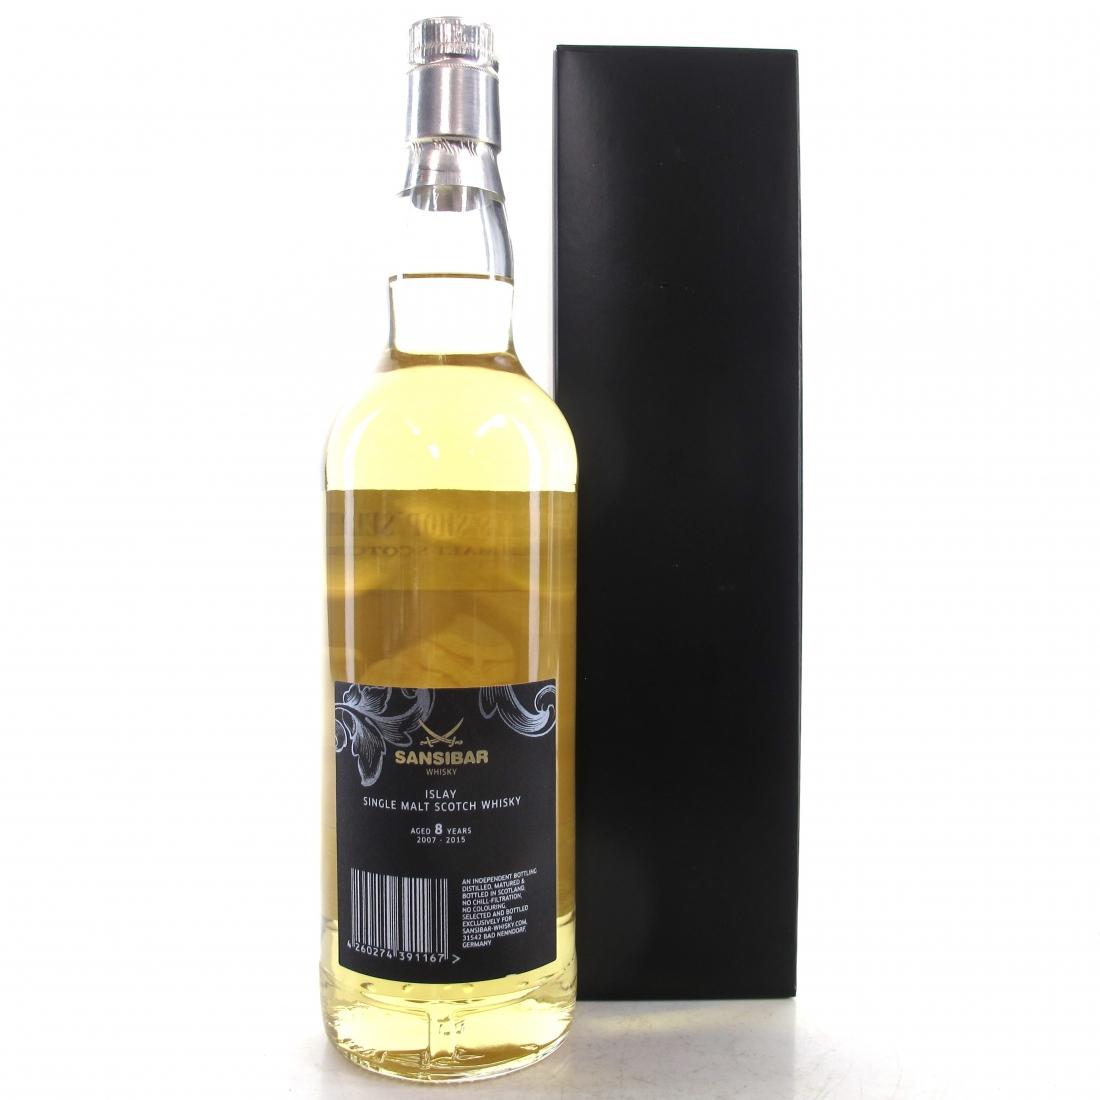 South Islay Single Malt 2007 Sansibar 8 Year Old / Spirits Shop' Selection